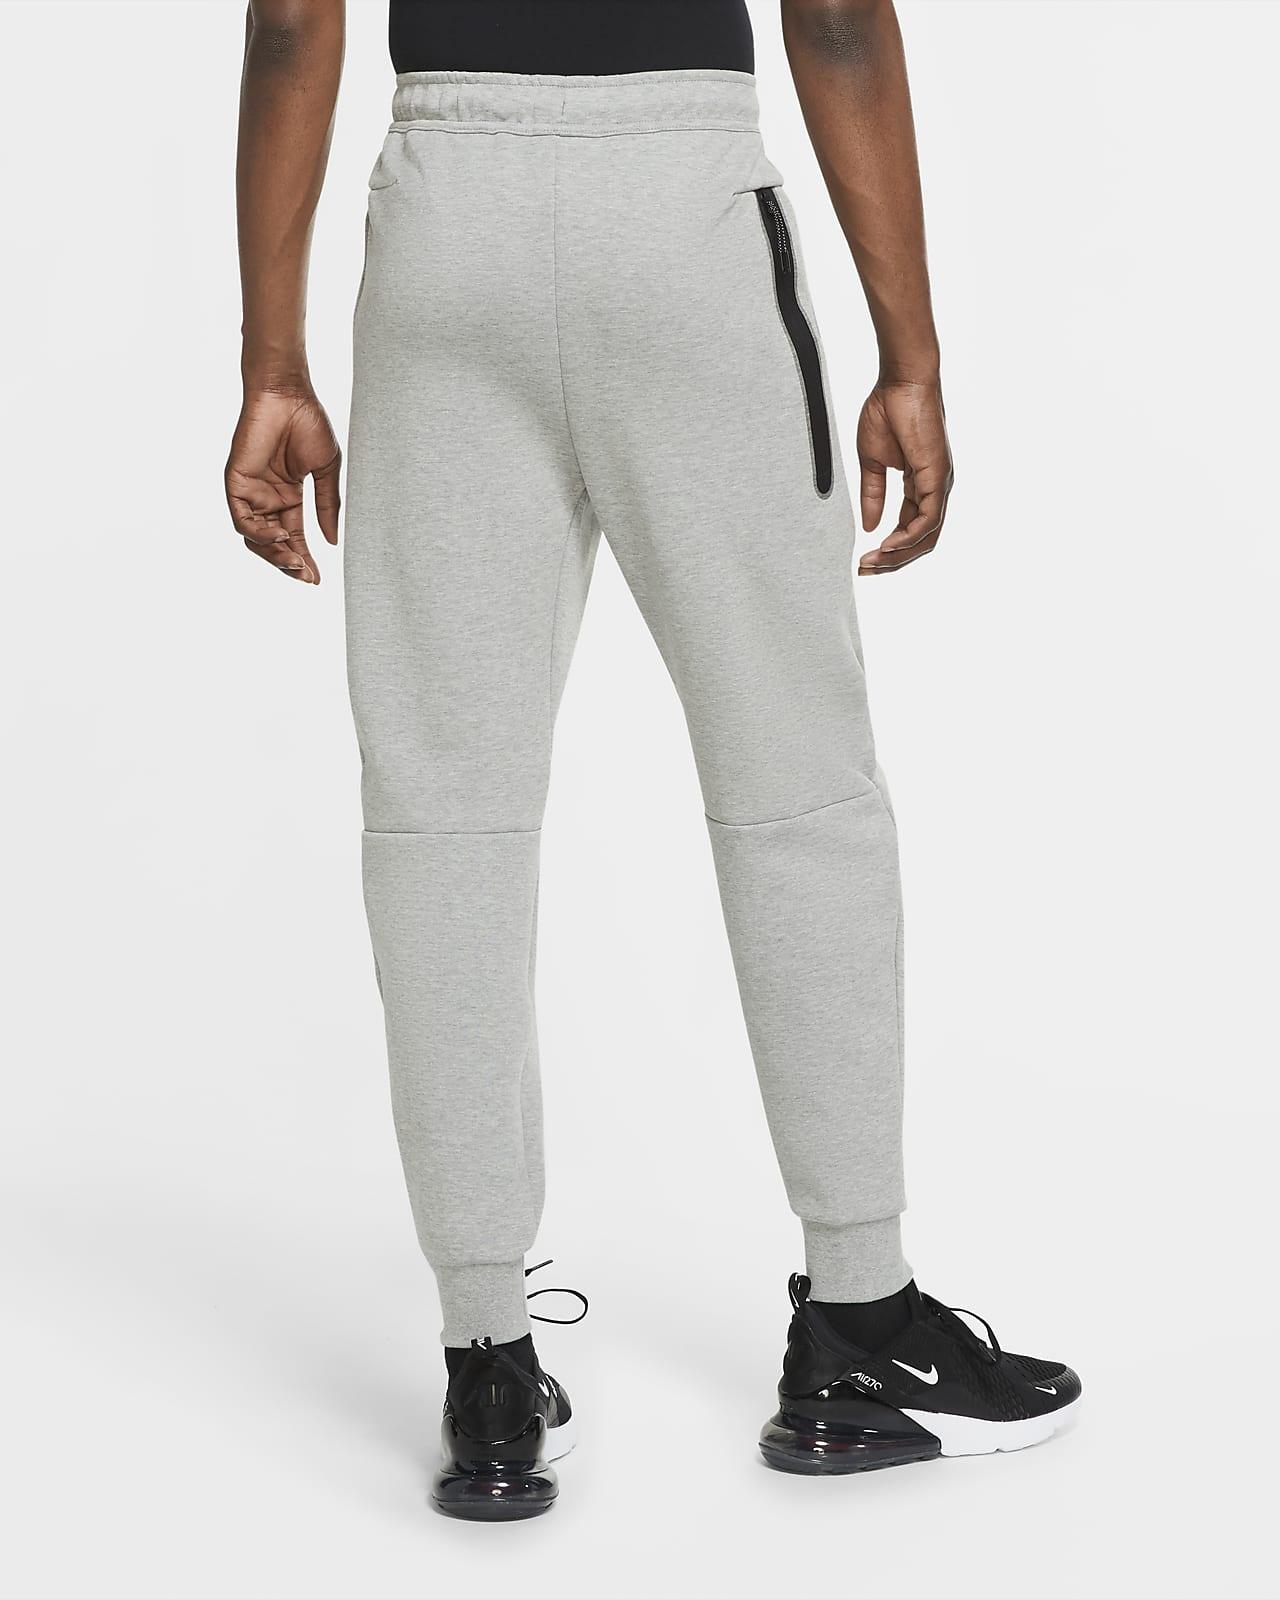 Pantalones Deportivos Para Hombre Nike Sportswear Tech Fleece Nike Mx